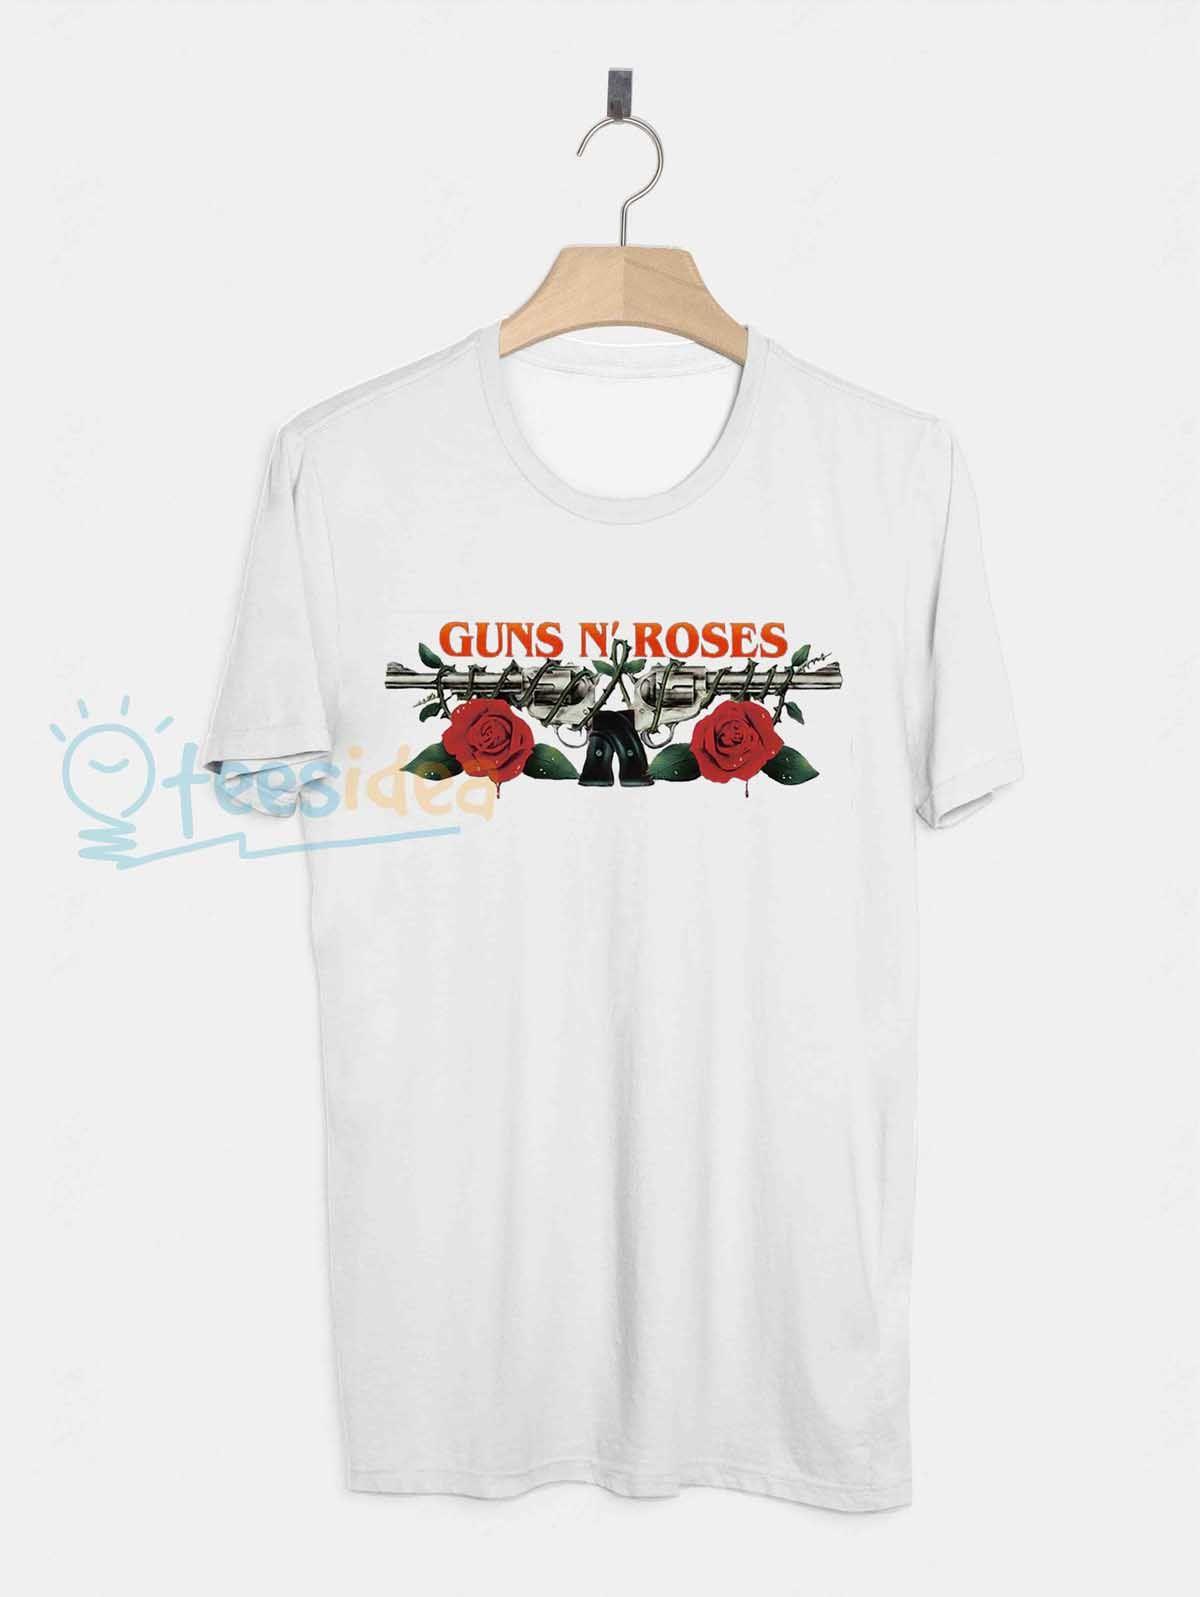 Guns N Roses Logo Unisex Adult T Shirt - Get 10% Off!!! - Use Coupon Code 'TEES10'